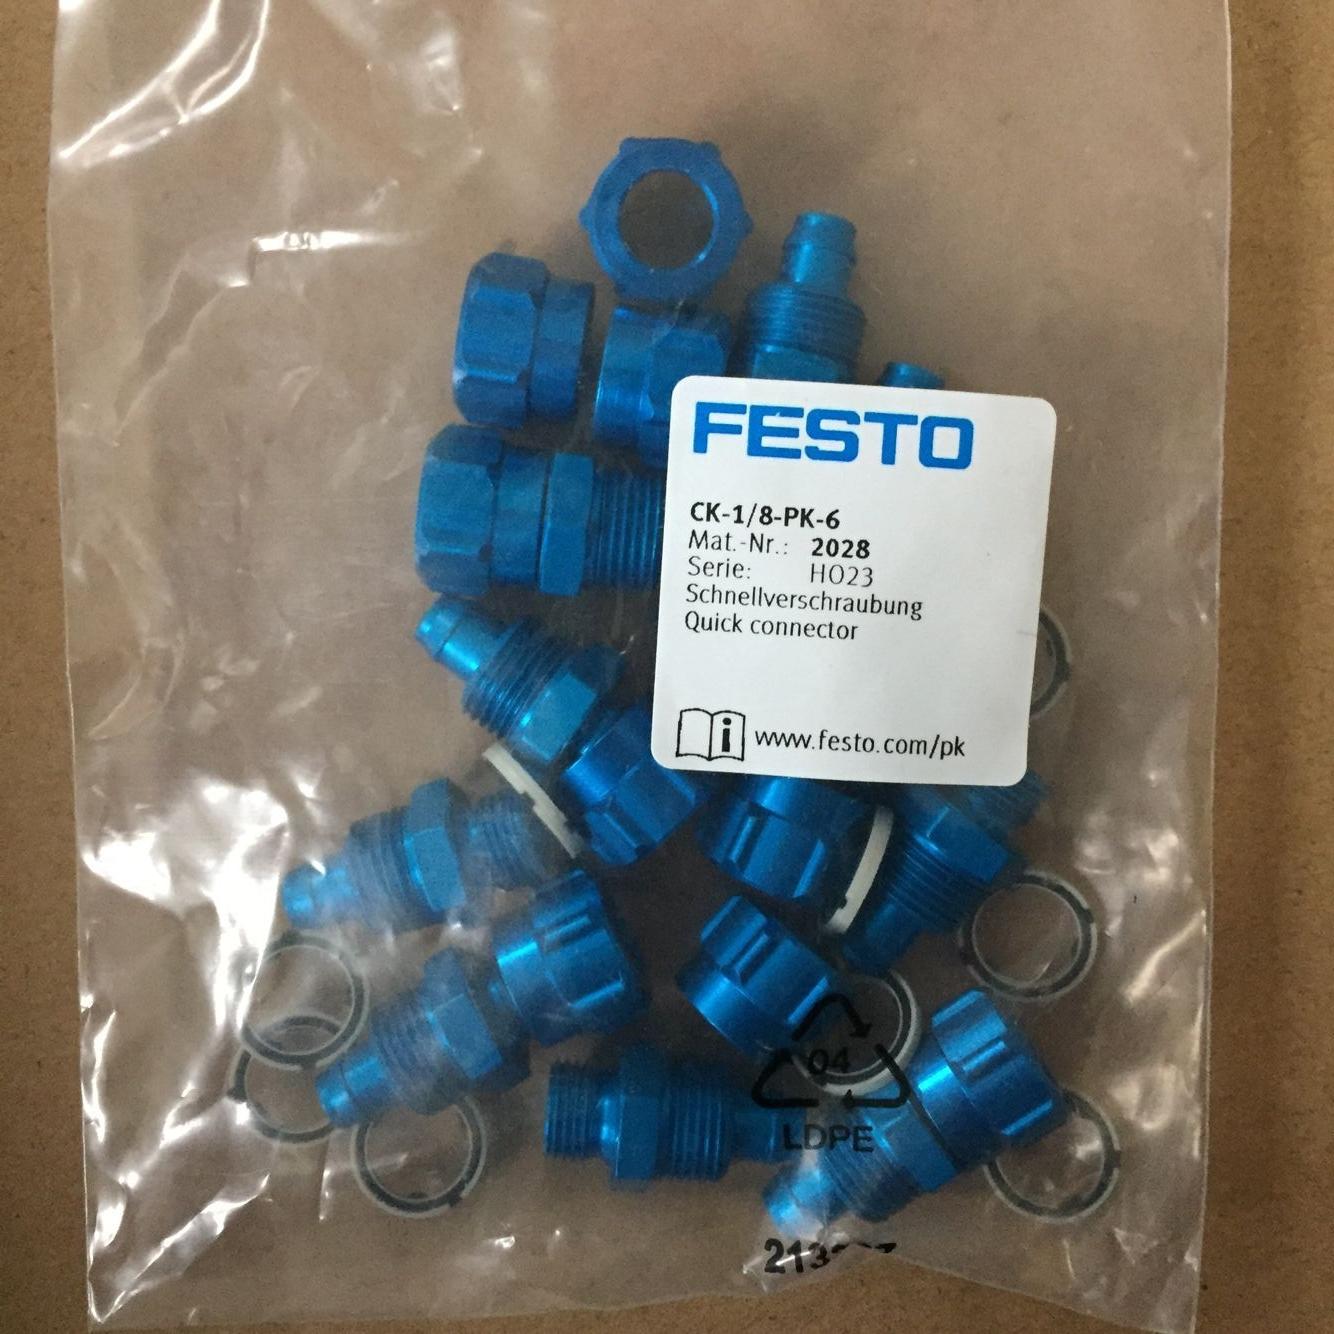 Van FESTO CK-1/8-PK-6 2028